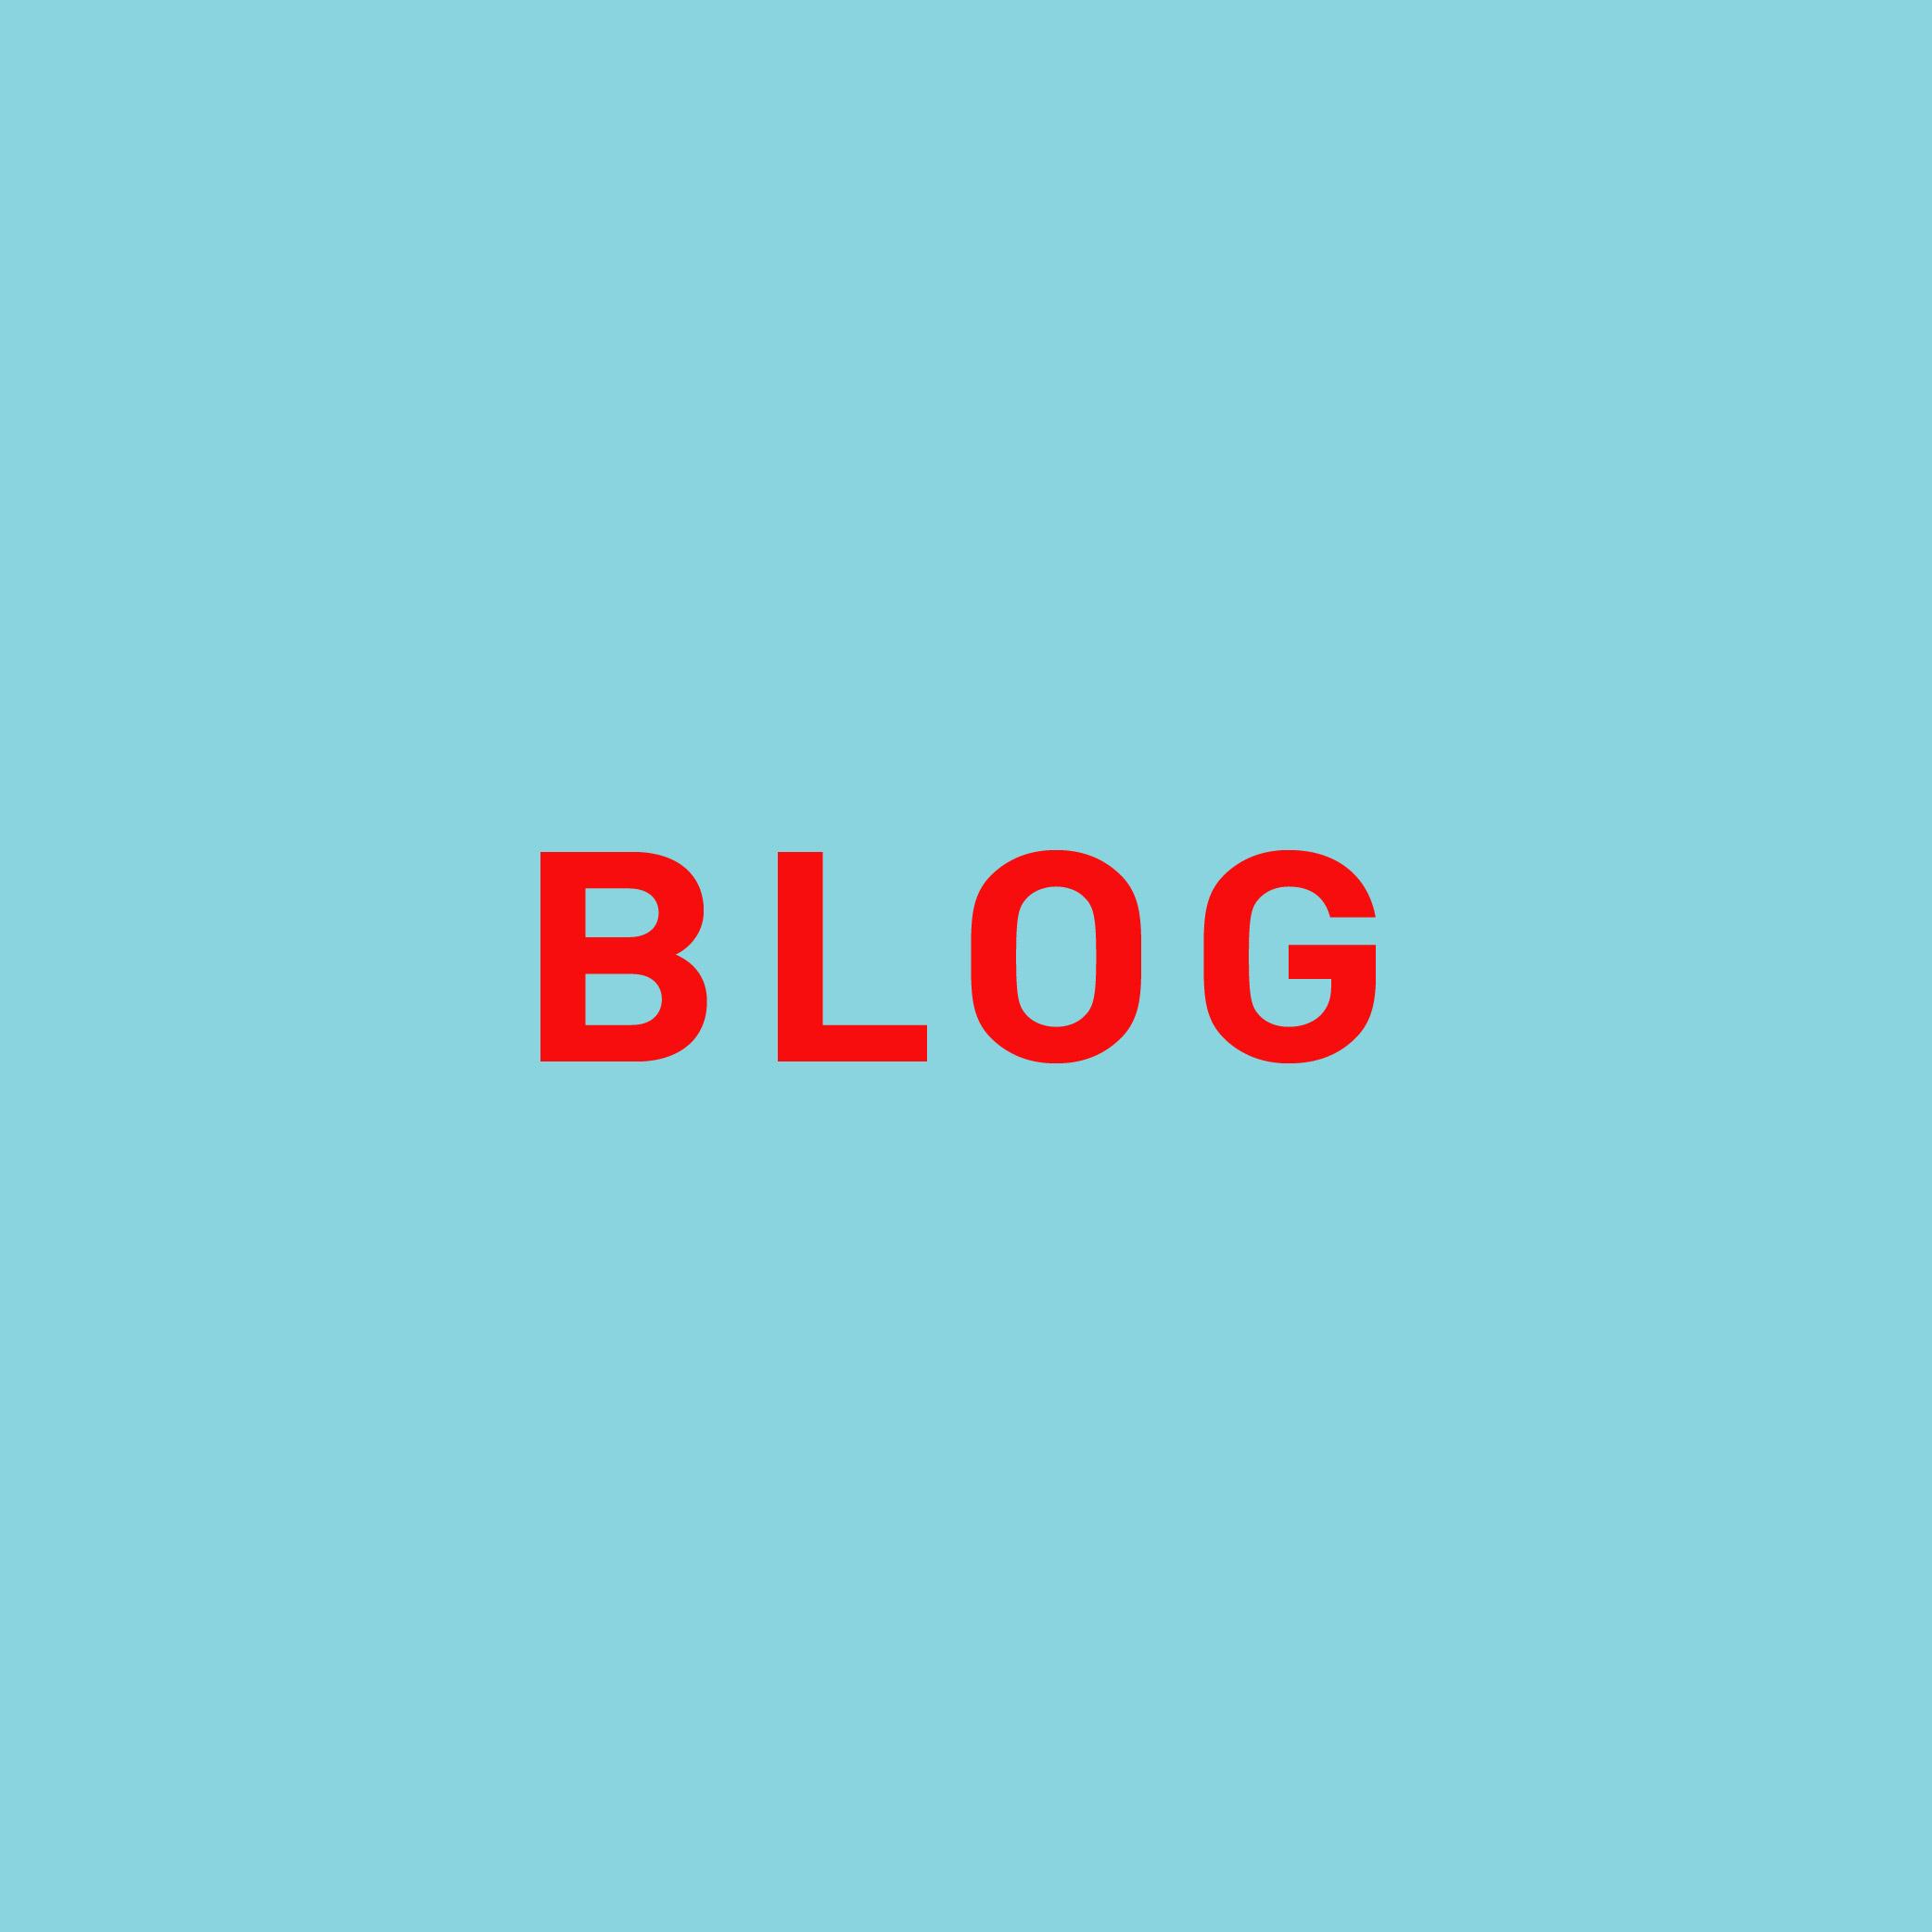 RedBlog1.jpg